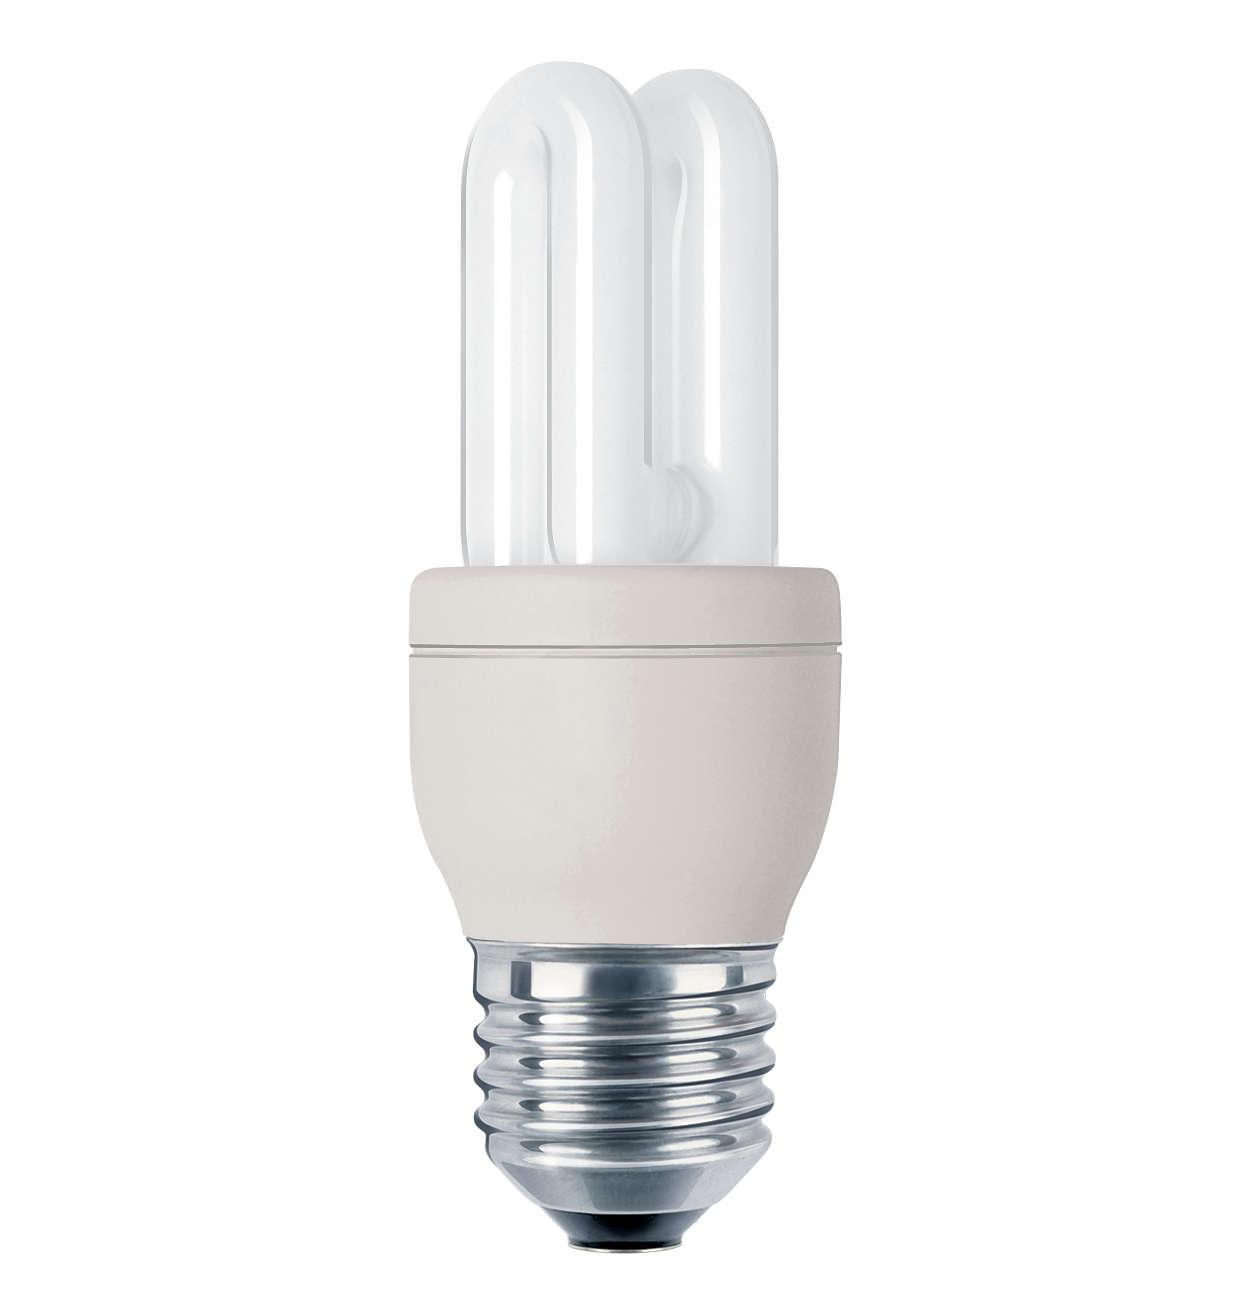 Liten, kraftfull, vacker belysning